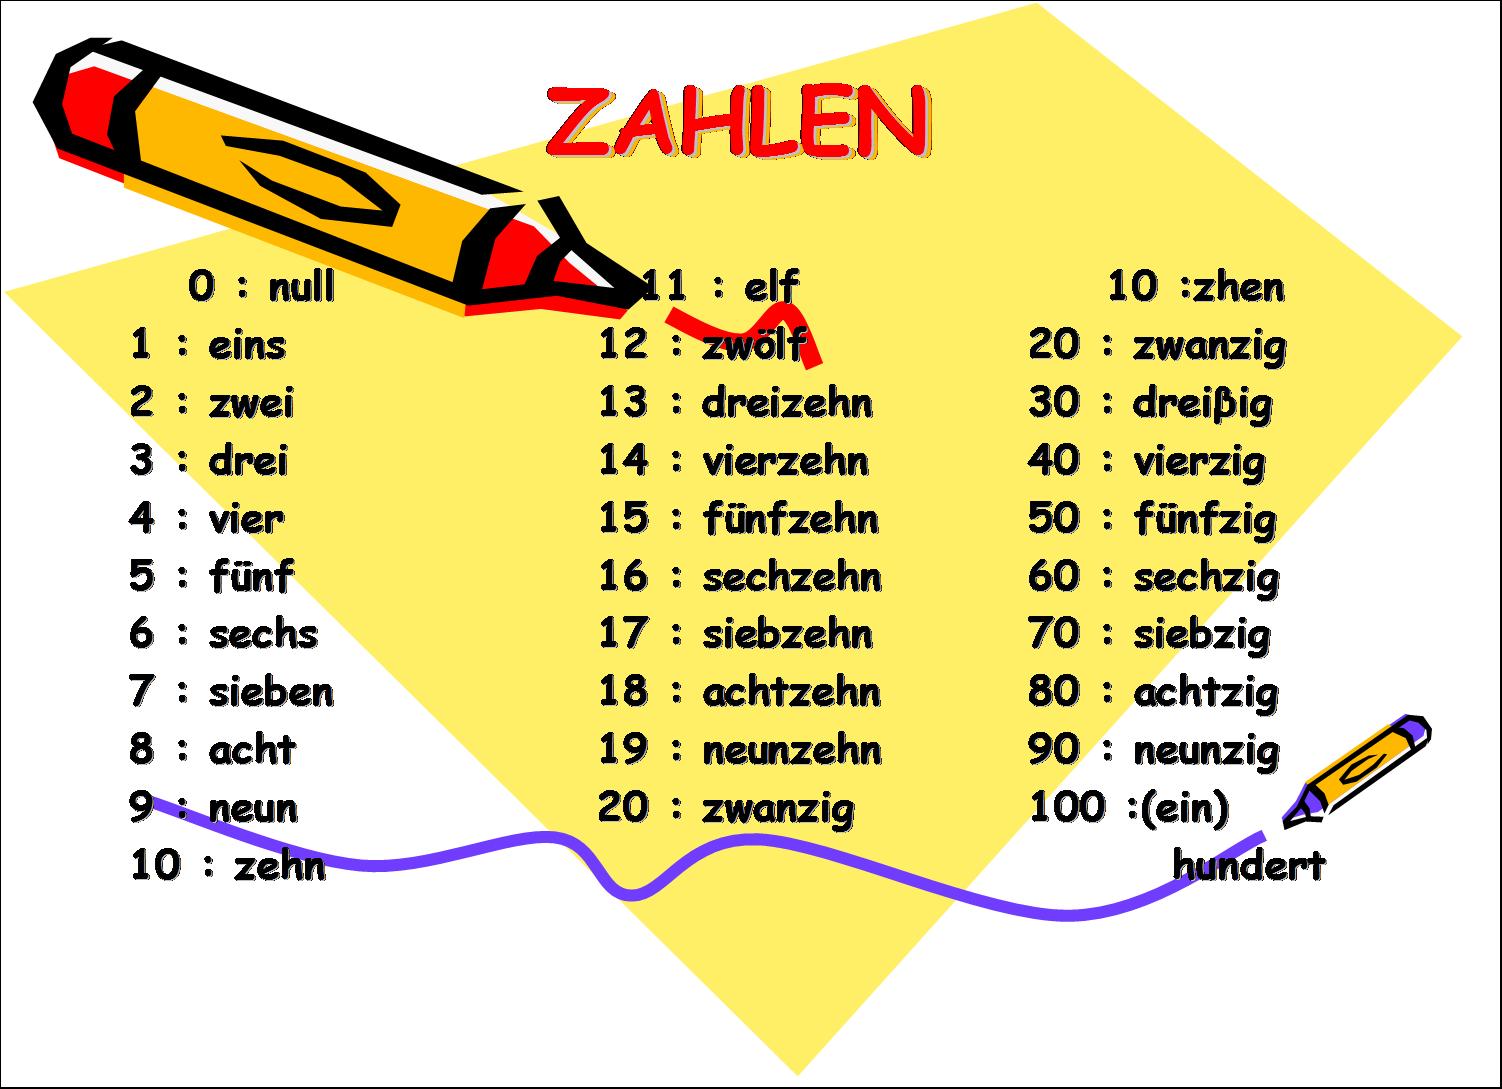 Puisi Bahasa Jerman Baharuddin Zainal Wikipedia Bahasa Melayu Ensiklopedia Yukkk Belajar Bahasa Jerman Part 2 Bukan Sekedar Materi